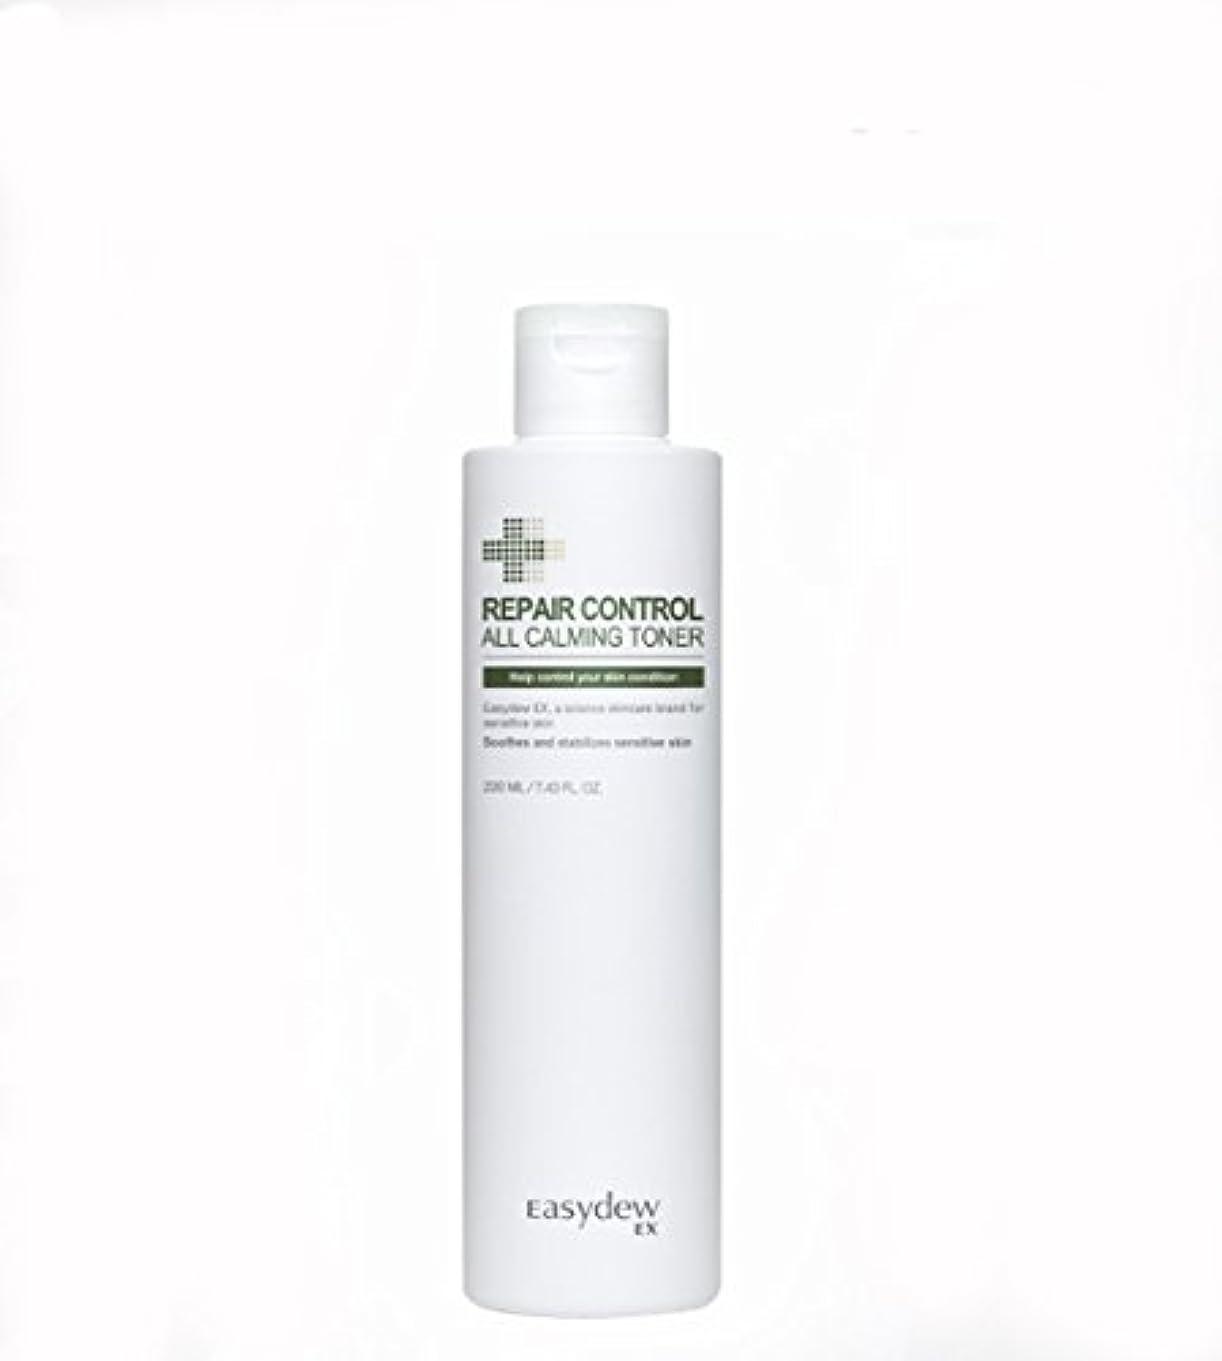 [EASYDEW ] EASY DEW EX オールカーミングエッセンシャルトナーEASY DEW EX- ALL CALMING ESSENTIAL TONER 韓国の有名皮膚科化粧品 210ml [海外直送品]